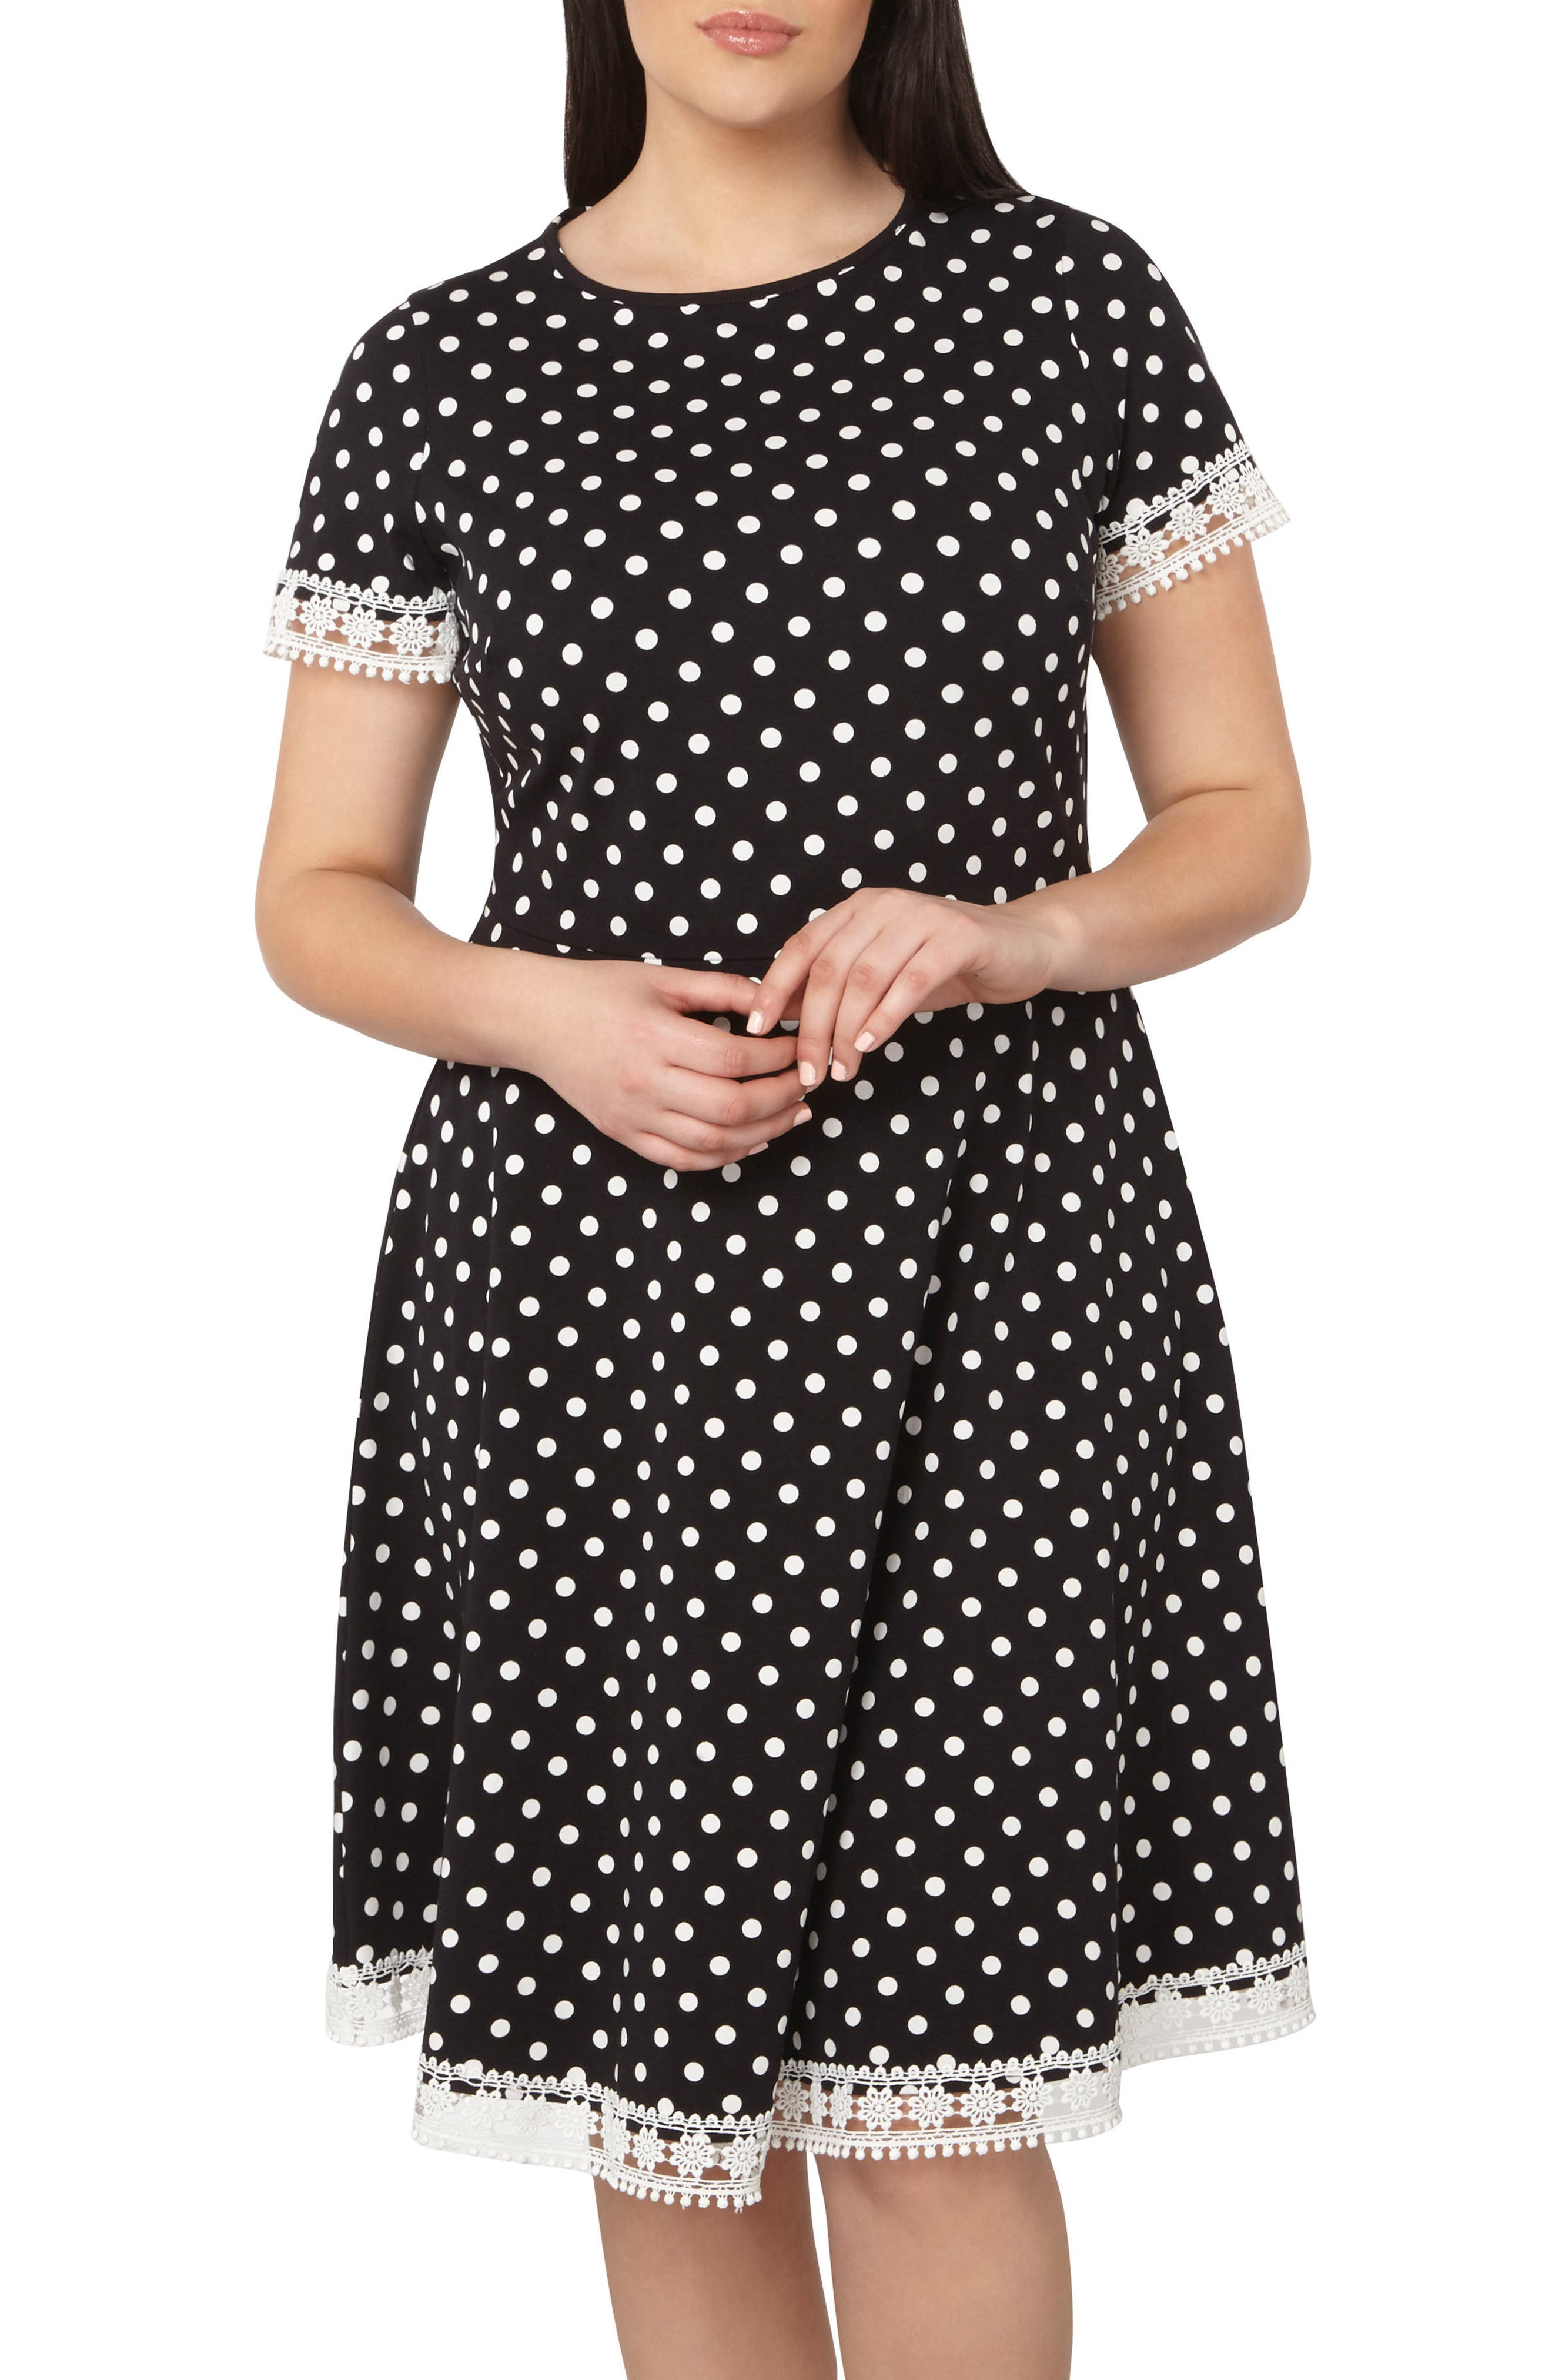 Alternate Image 1 Selected - Dorothy Perkins Polka Dot Fit & Flare Dress (Plus Size)